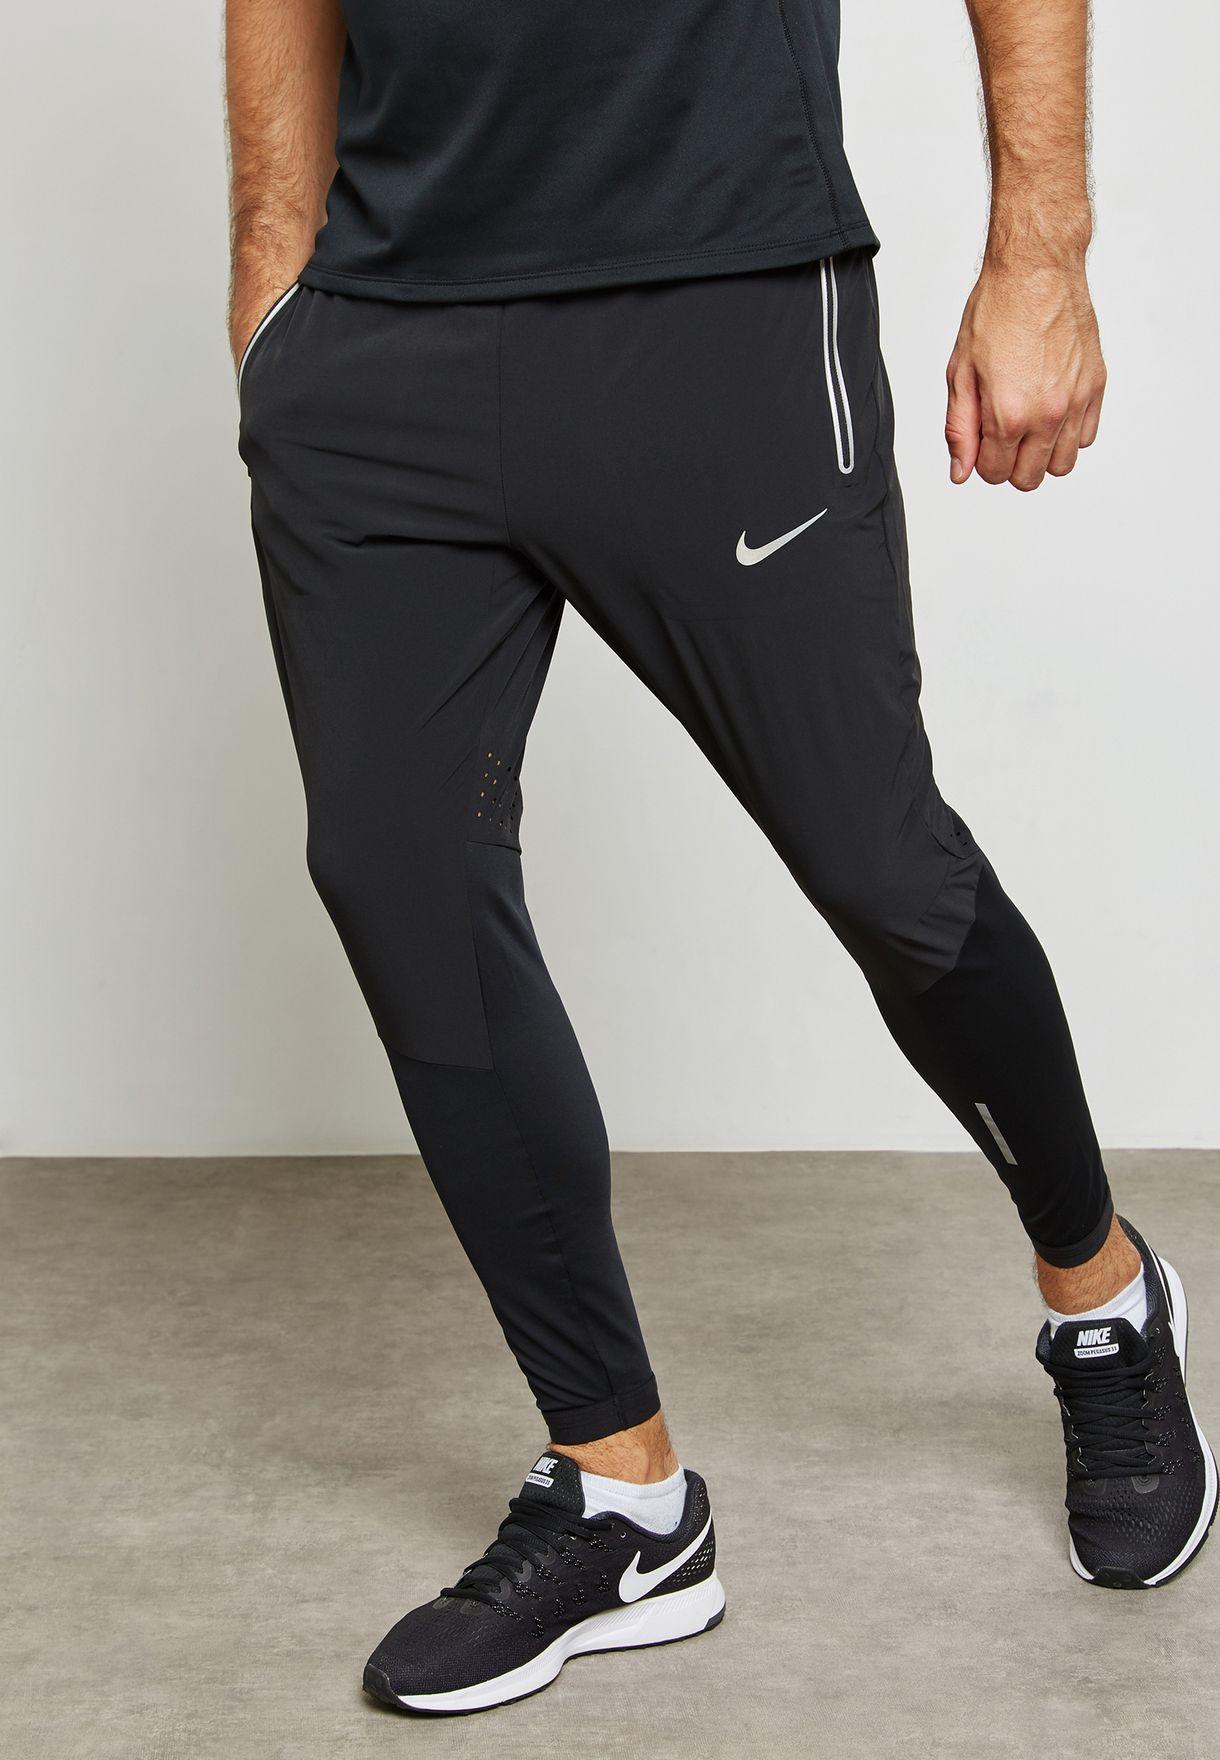 4364c7c8576b3 Shop Nike black Flex Swift Running Sweatpants 857840-010 for Men in ...